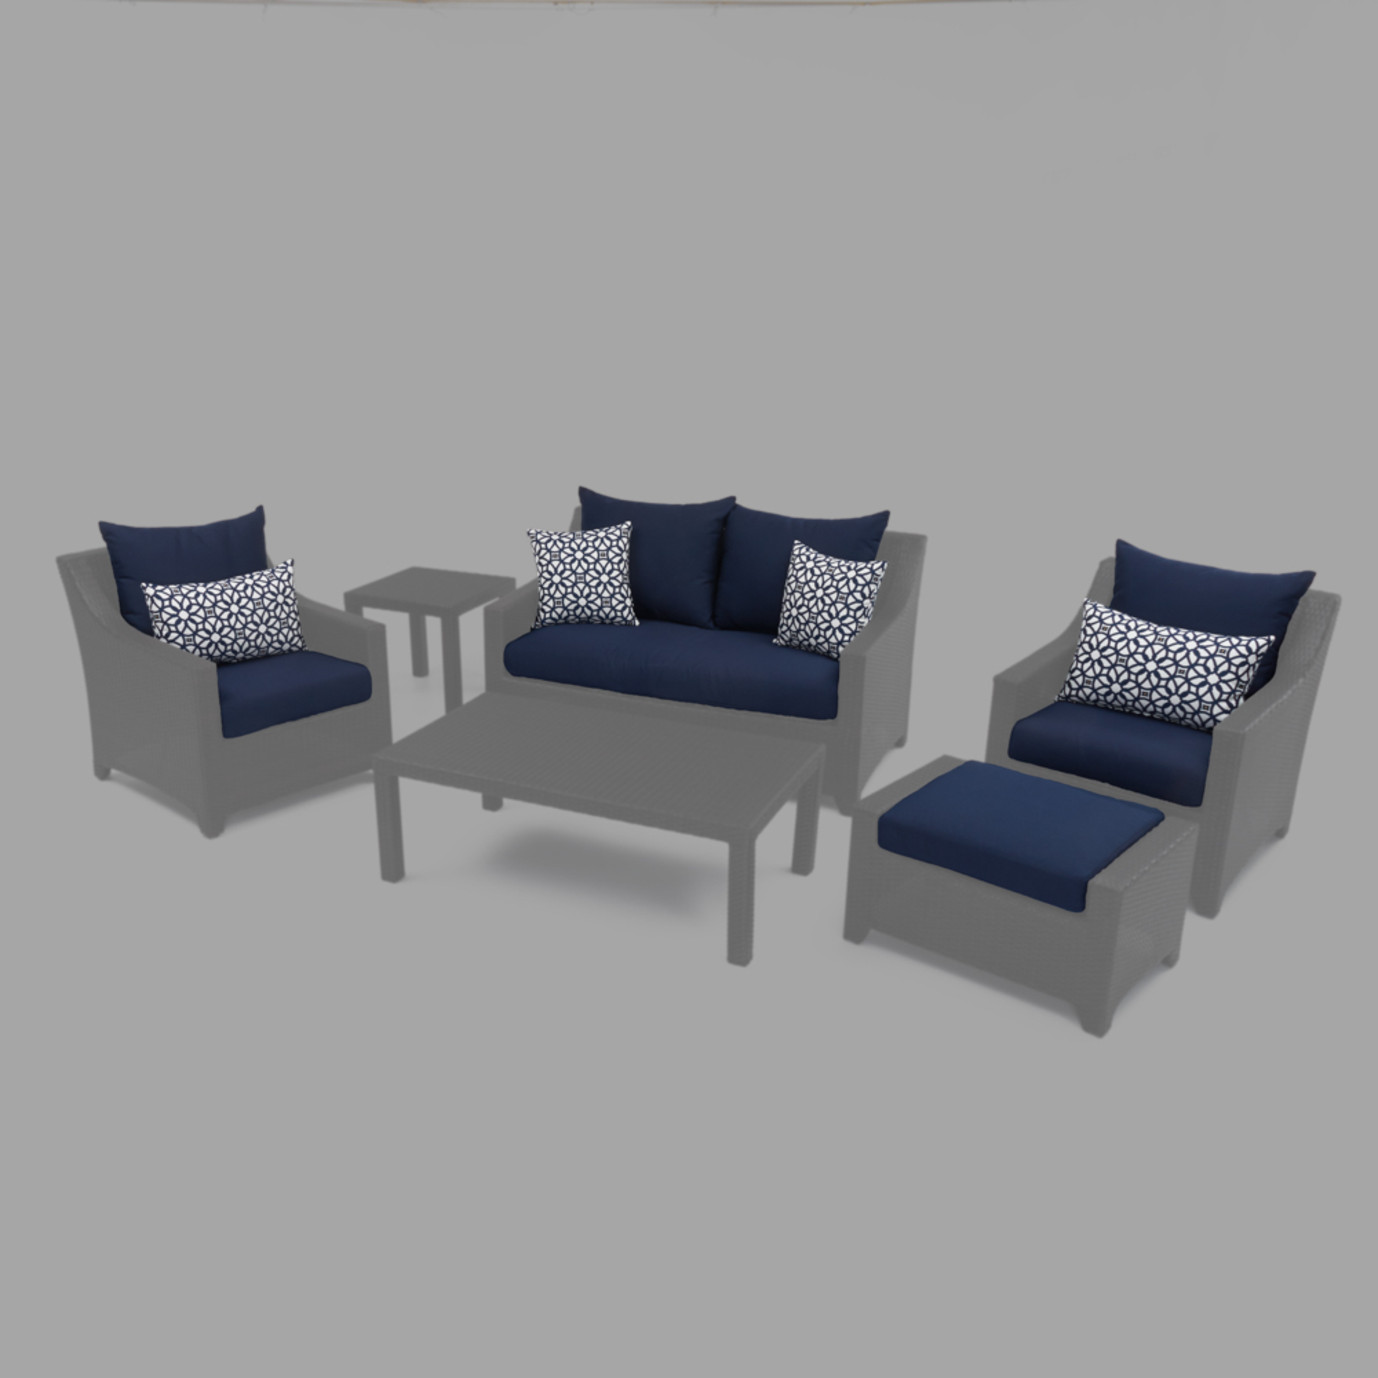 Modular Outdoor 6 Piece Love Cushion Cover Set